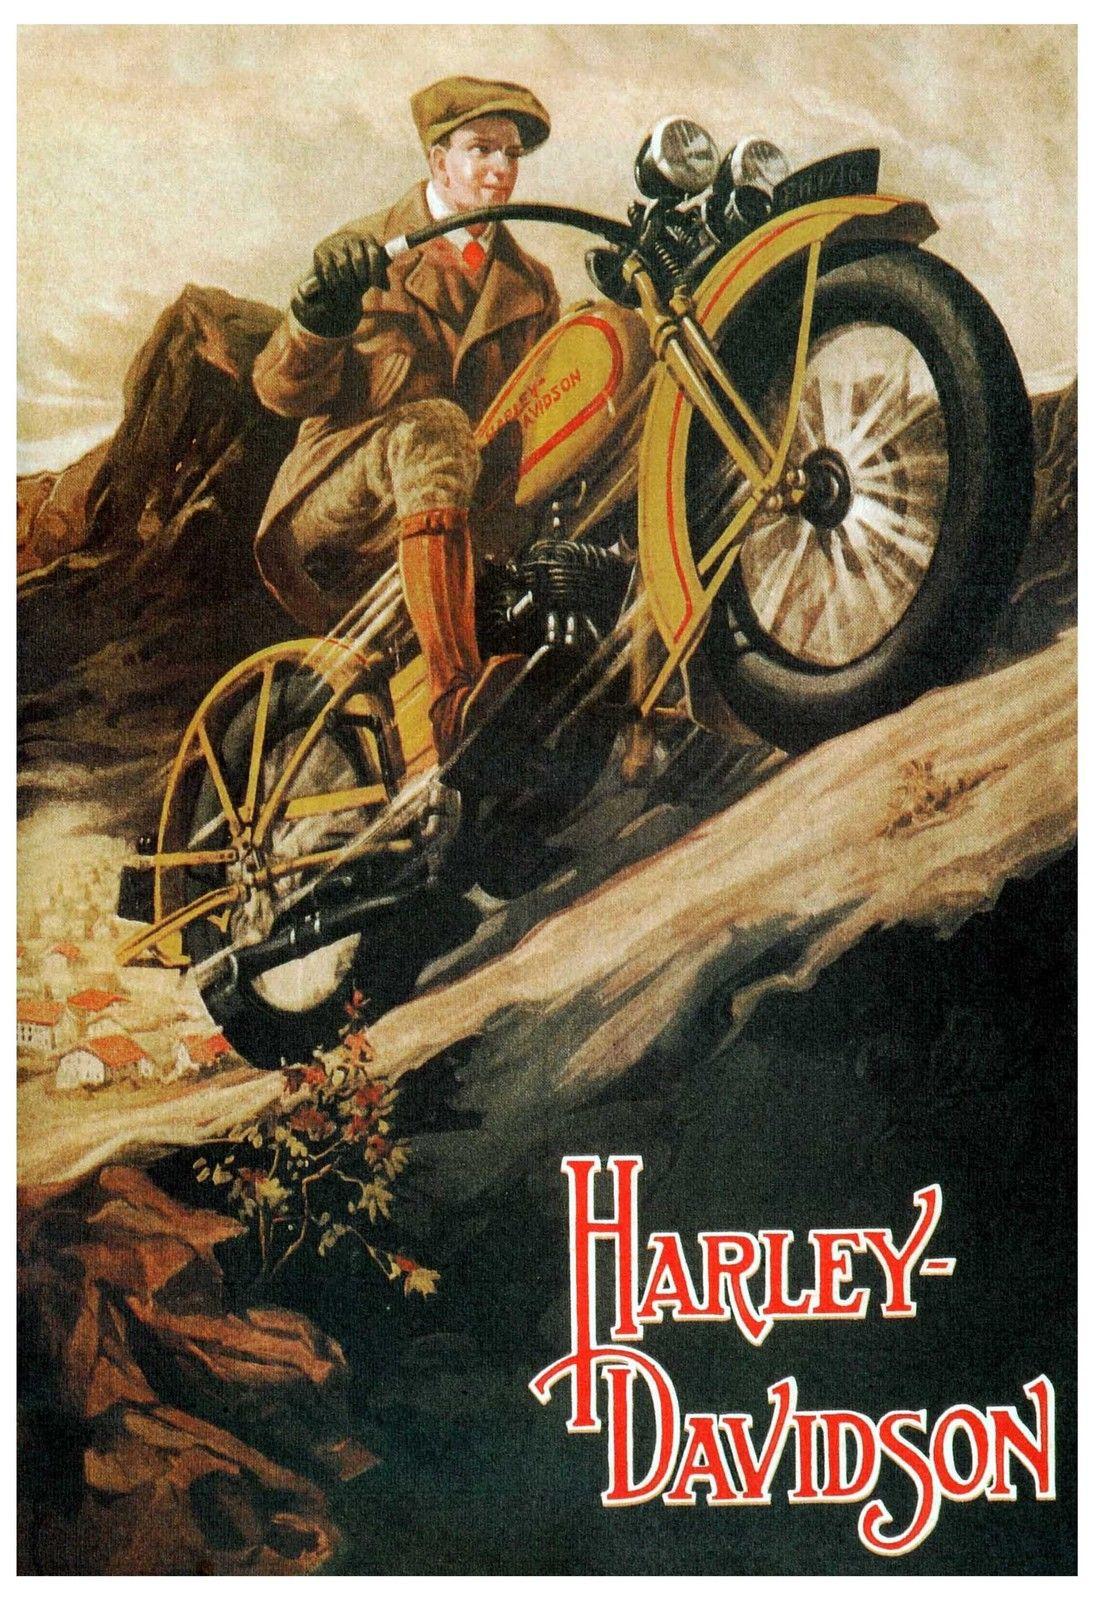 Motorcycle Poster Print Harley Davidson Vintage Style Poster Harley Davidson Posters Vintage Motorcycle Posters Harley Davidson Art